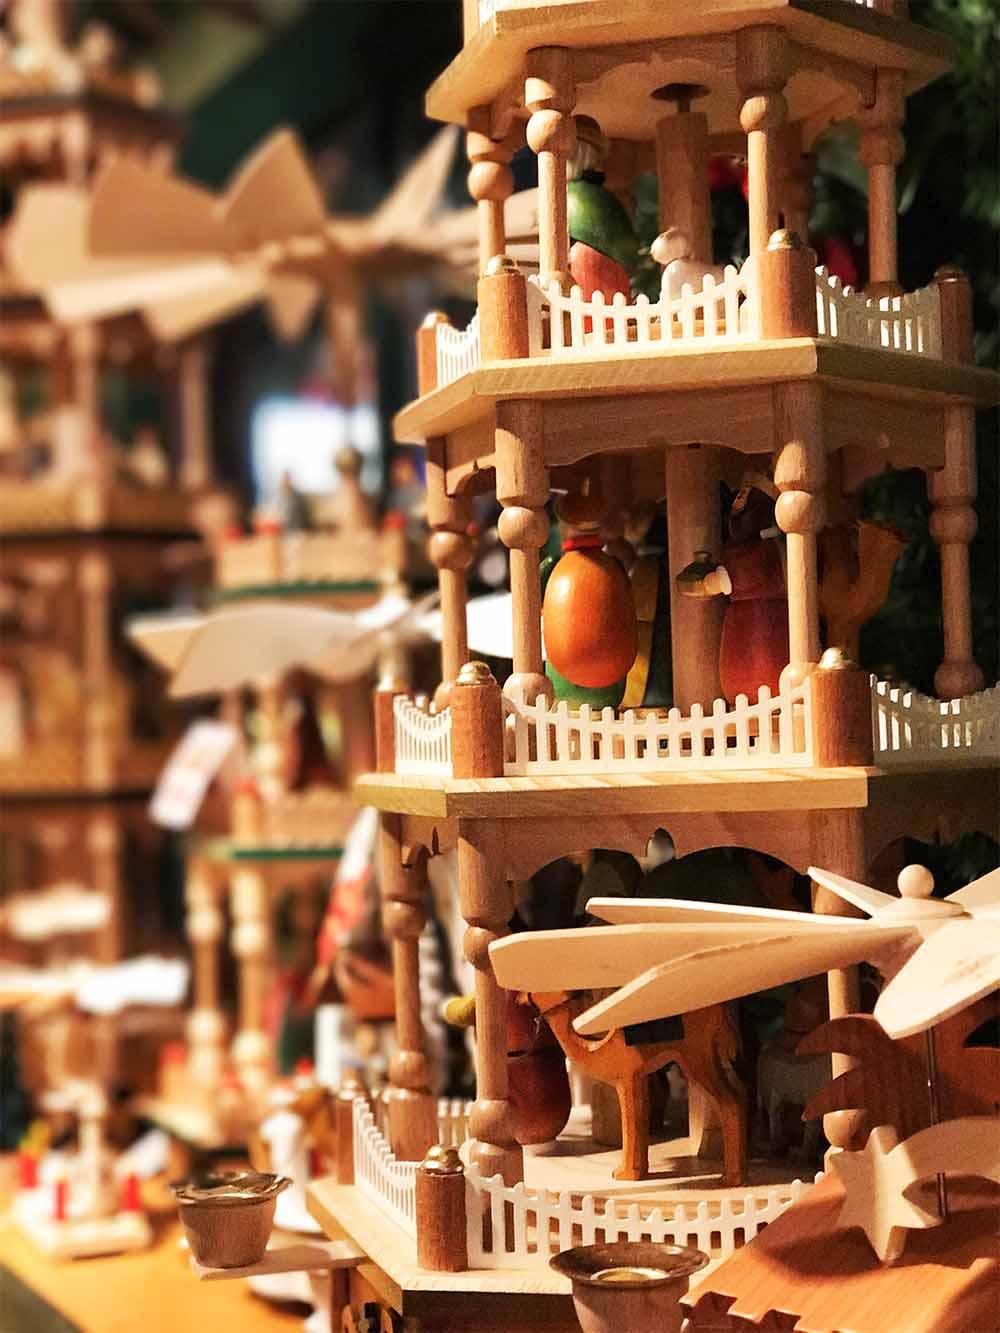 Traditional wooden Christmas pyramids on display.